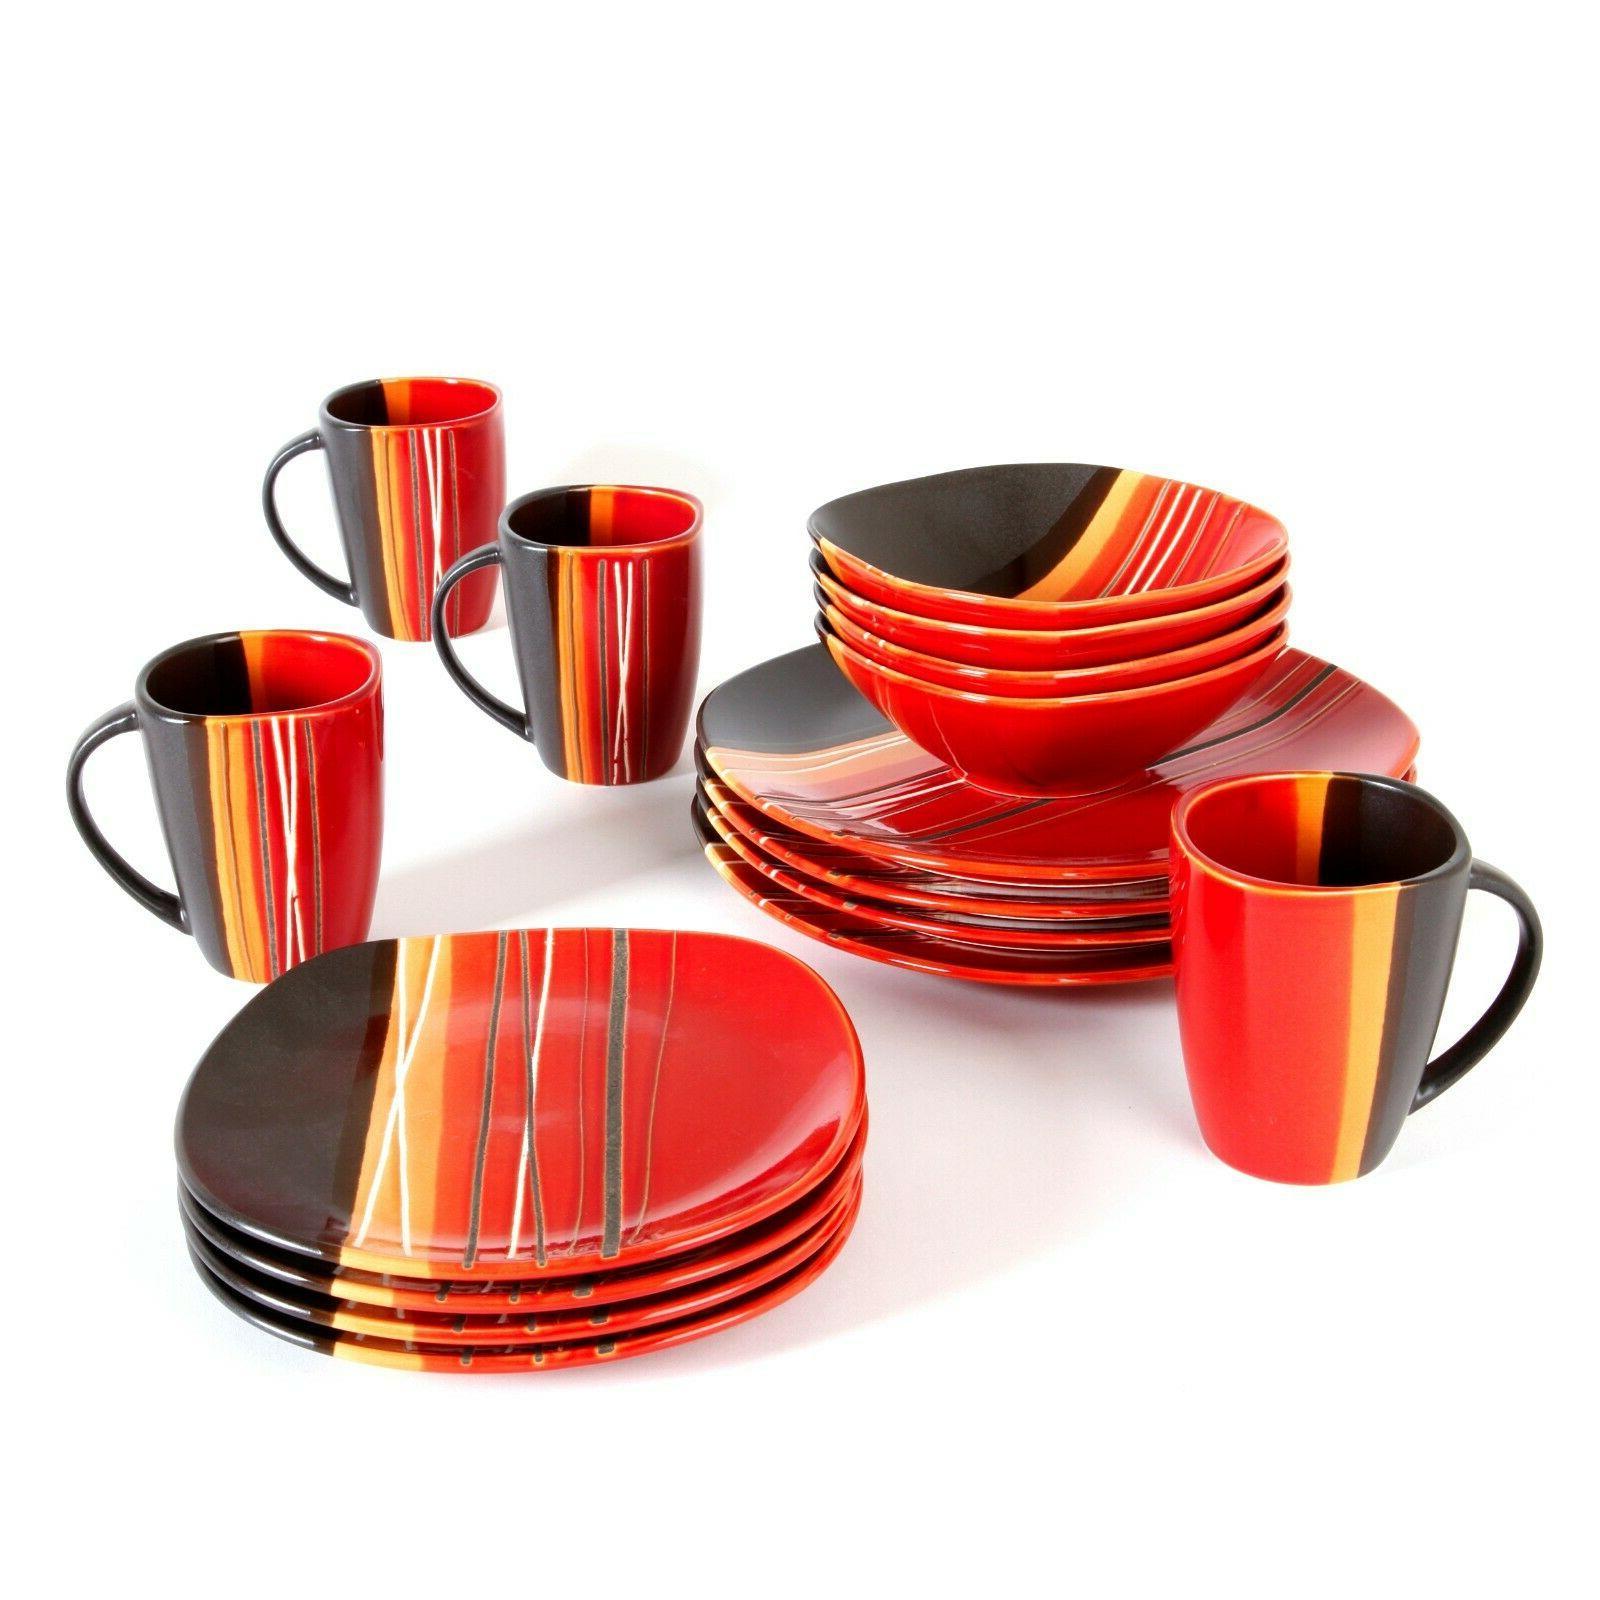 Square Dinnerware Set For 4 Stoneware Kitchen 16 pcs Plates